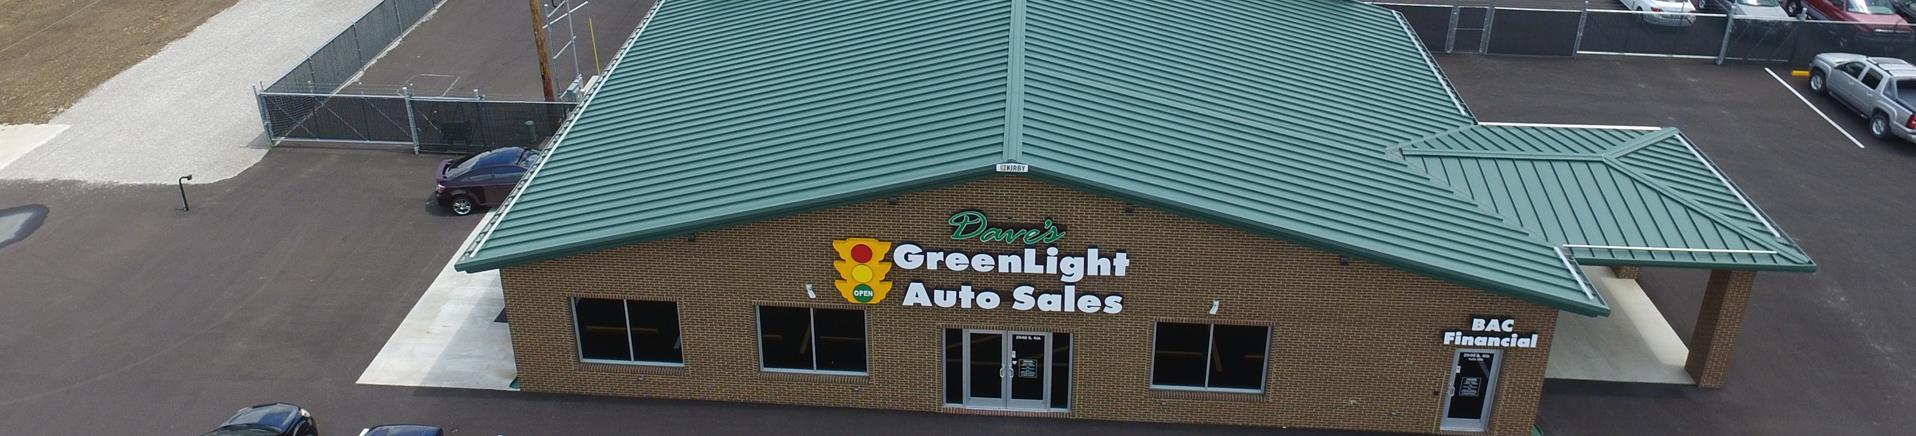 Greenlight Auto Sales >> Used Cars Greenville Il Used Cars Trucks Il Dave S Greenlight